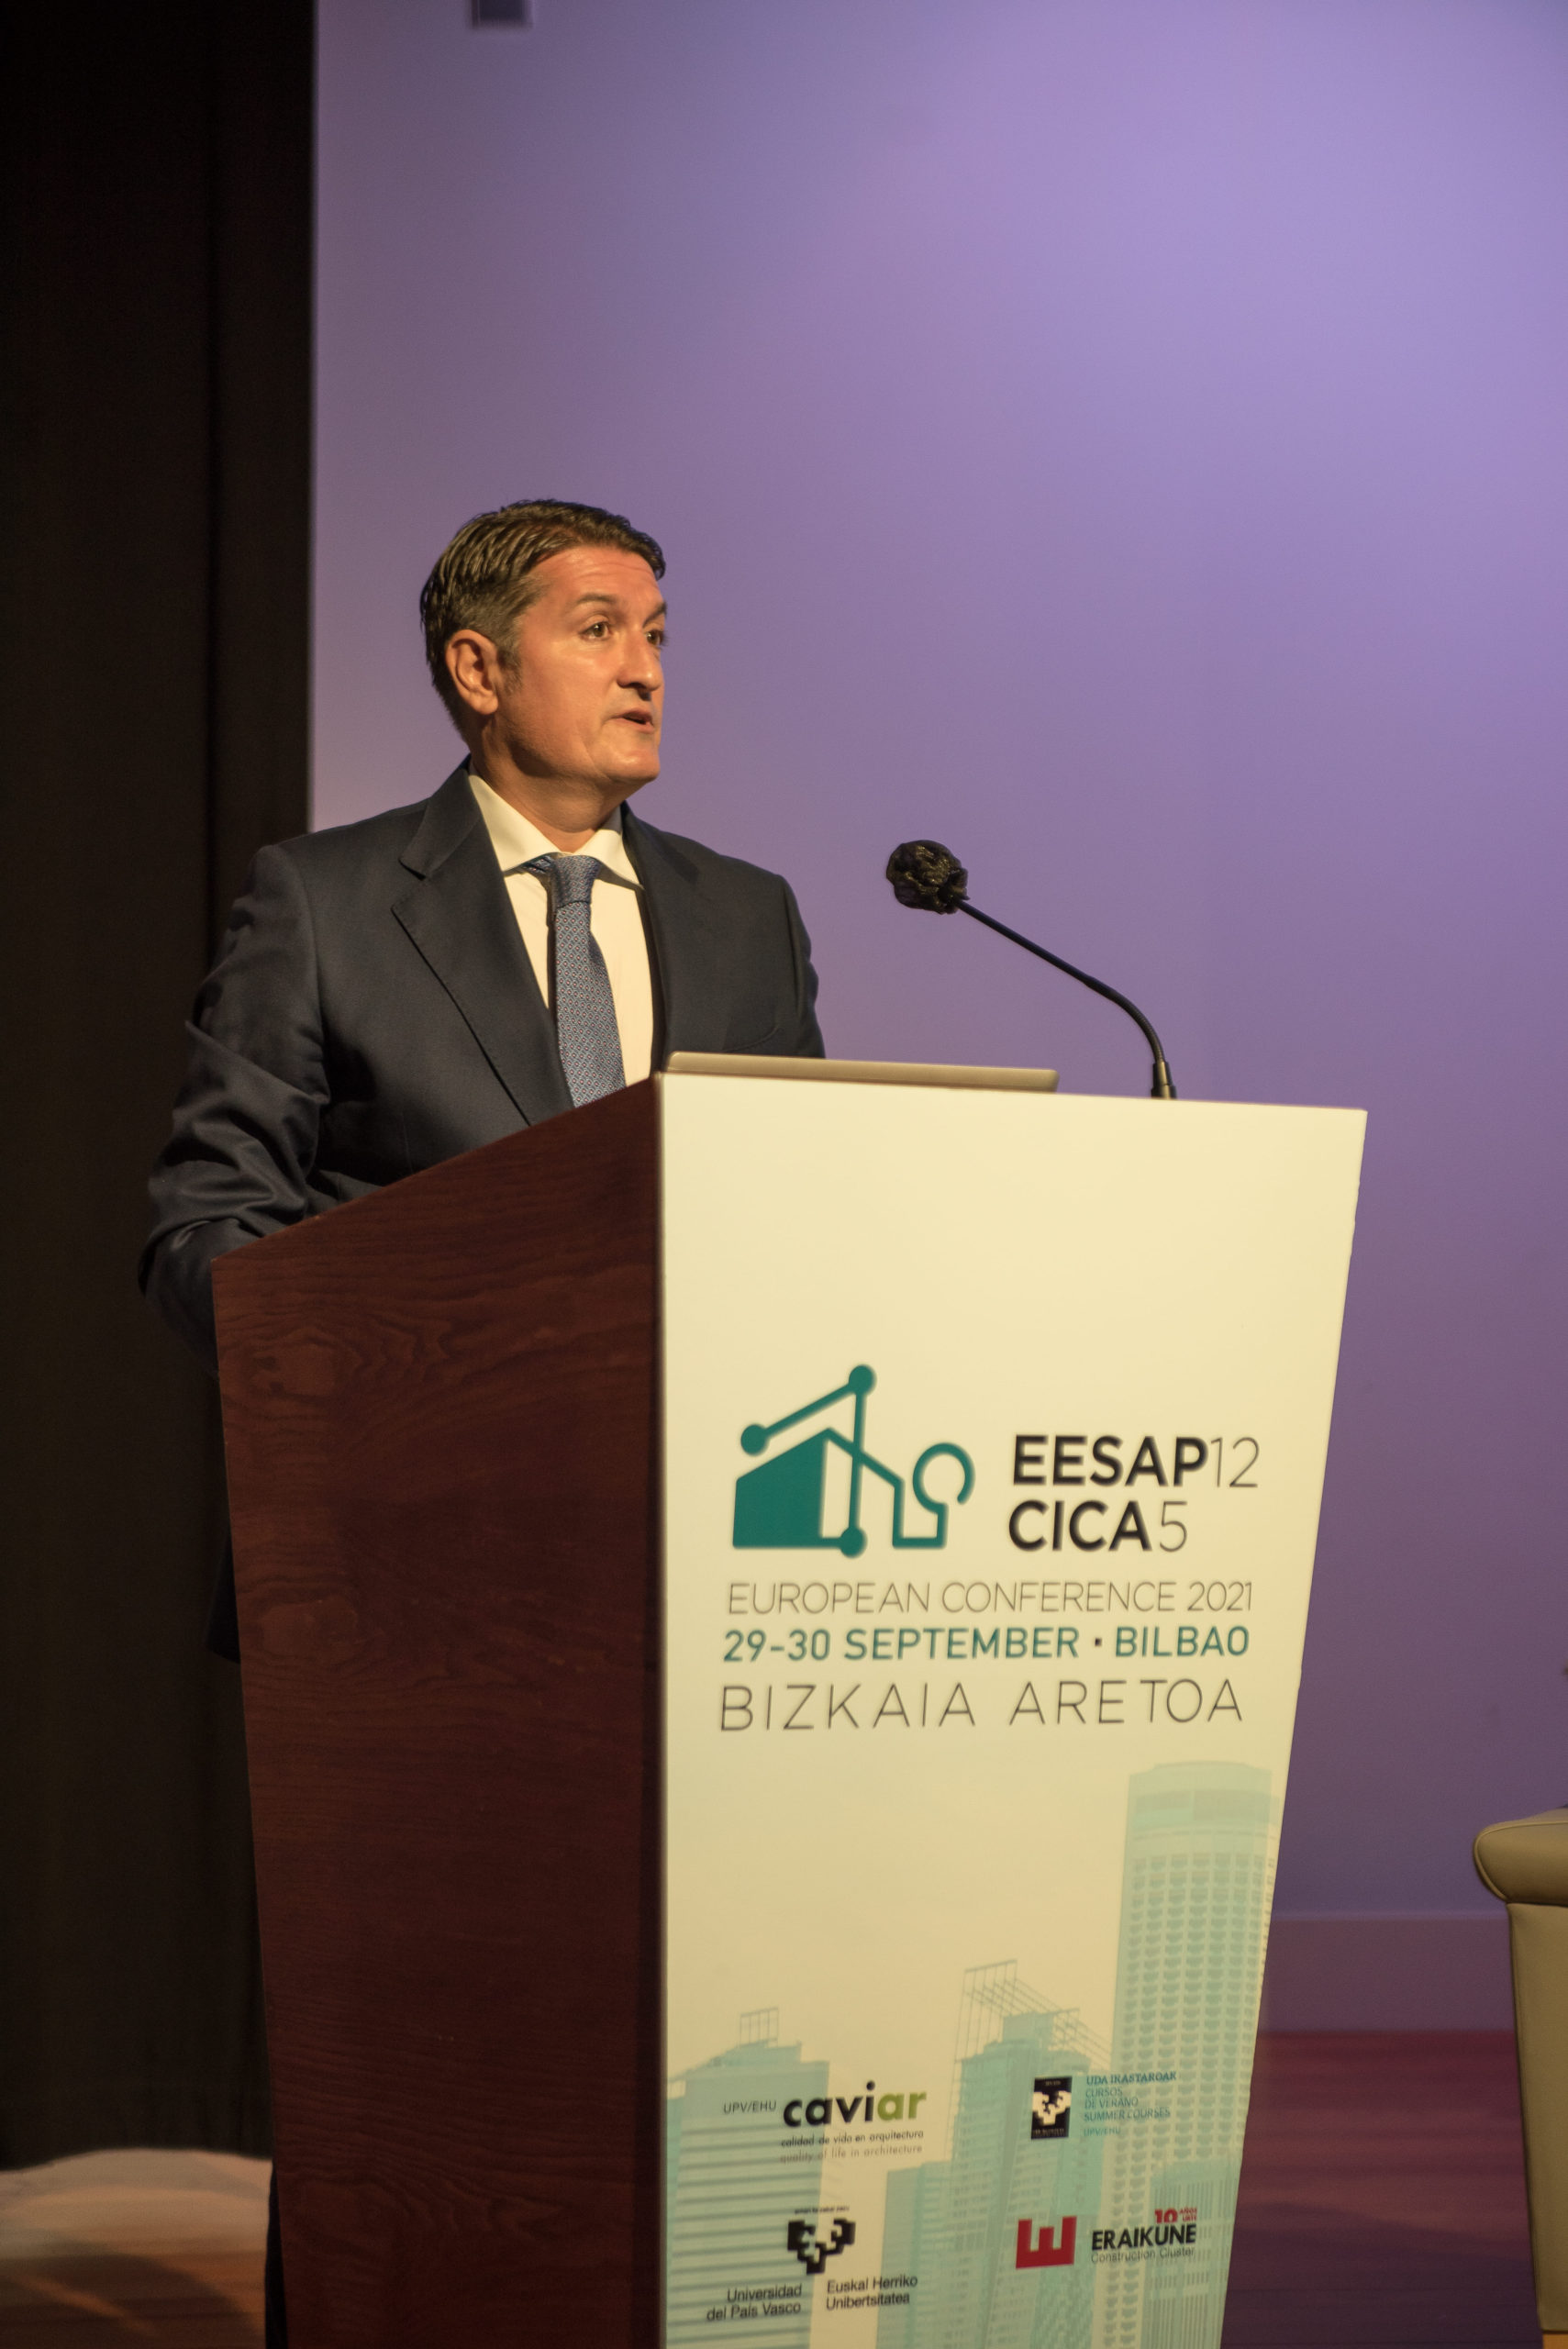 Congreso EESAP12-CICA5